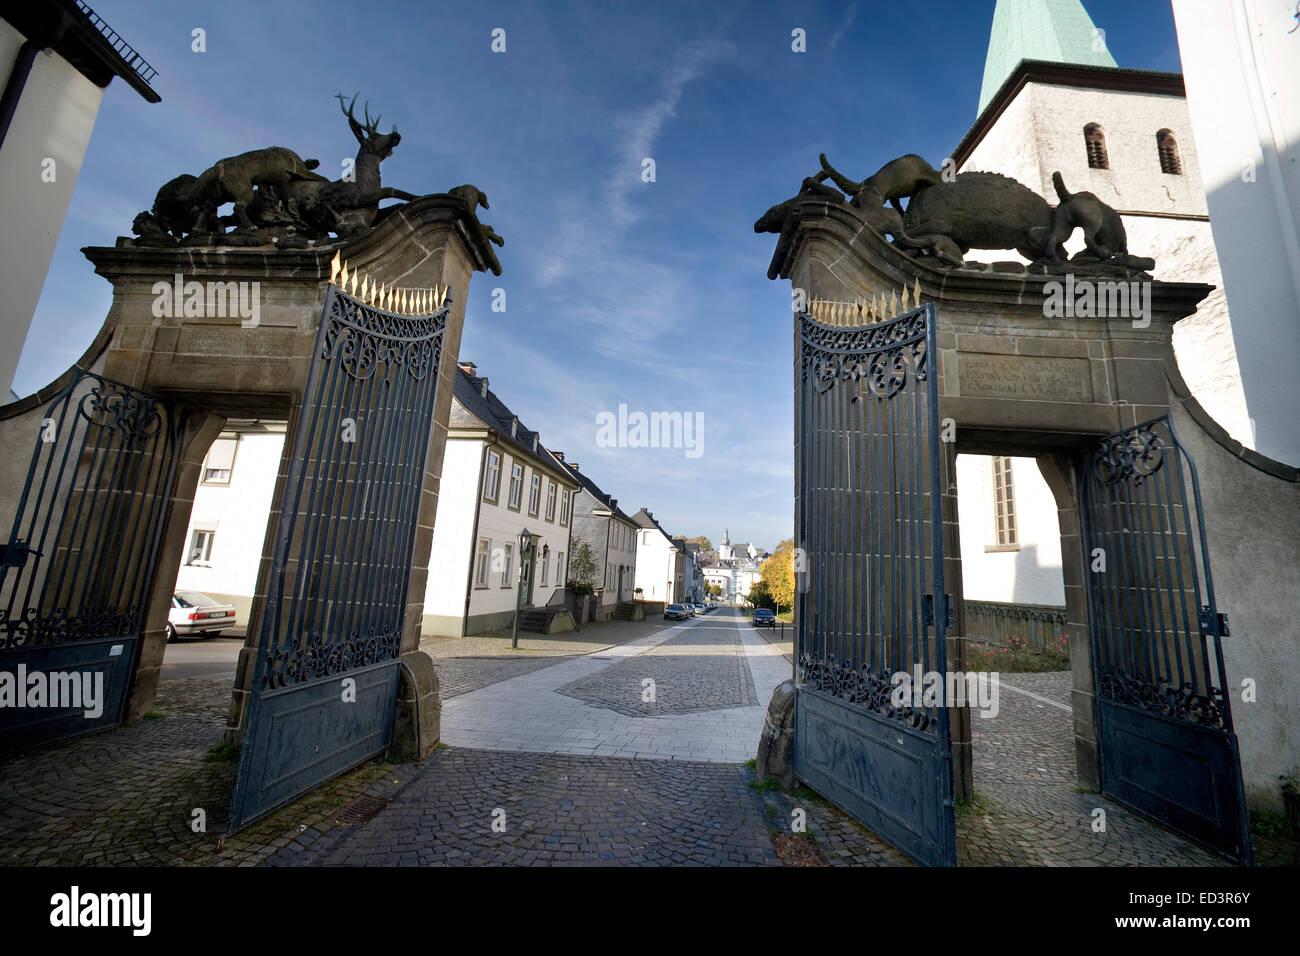 Hirschberger Tor gate, St Laurentius church, former monastery Wedinghausen, Arnsberg, North Rhine-Westphalia, Germany, - Stock Image